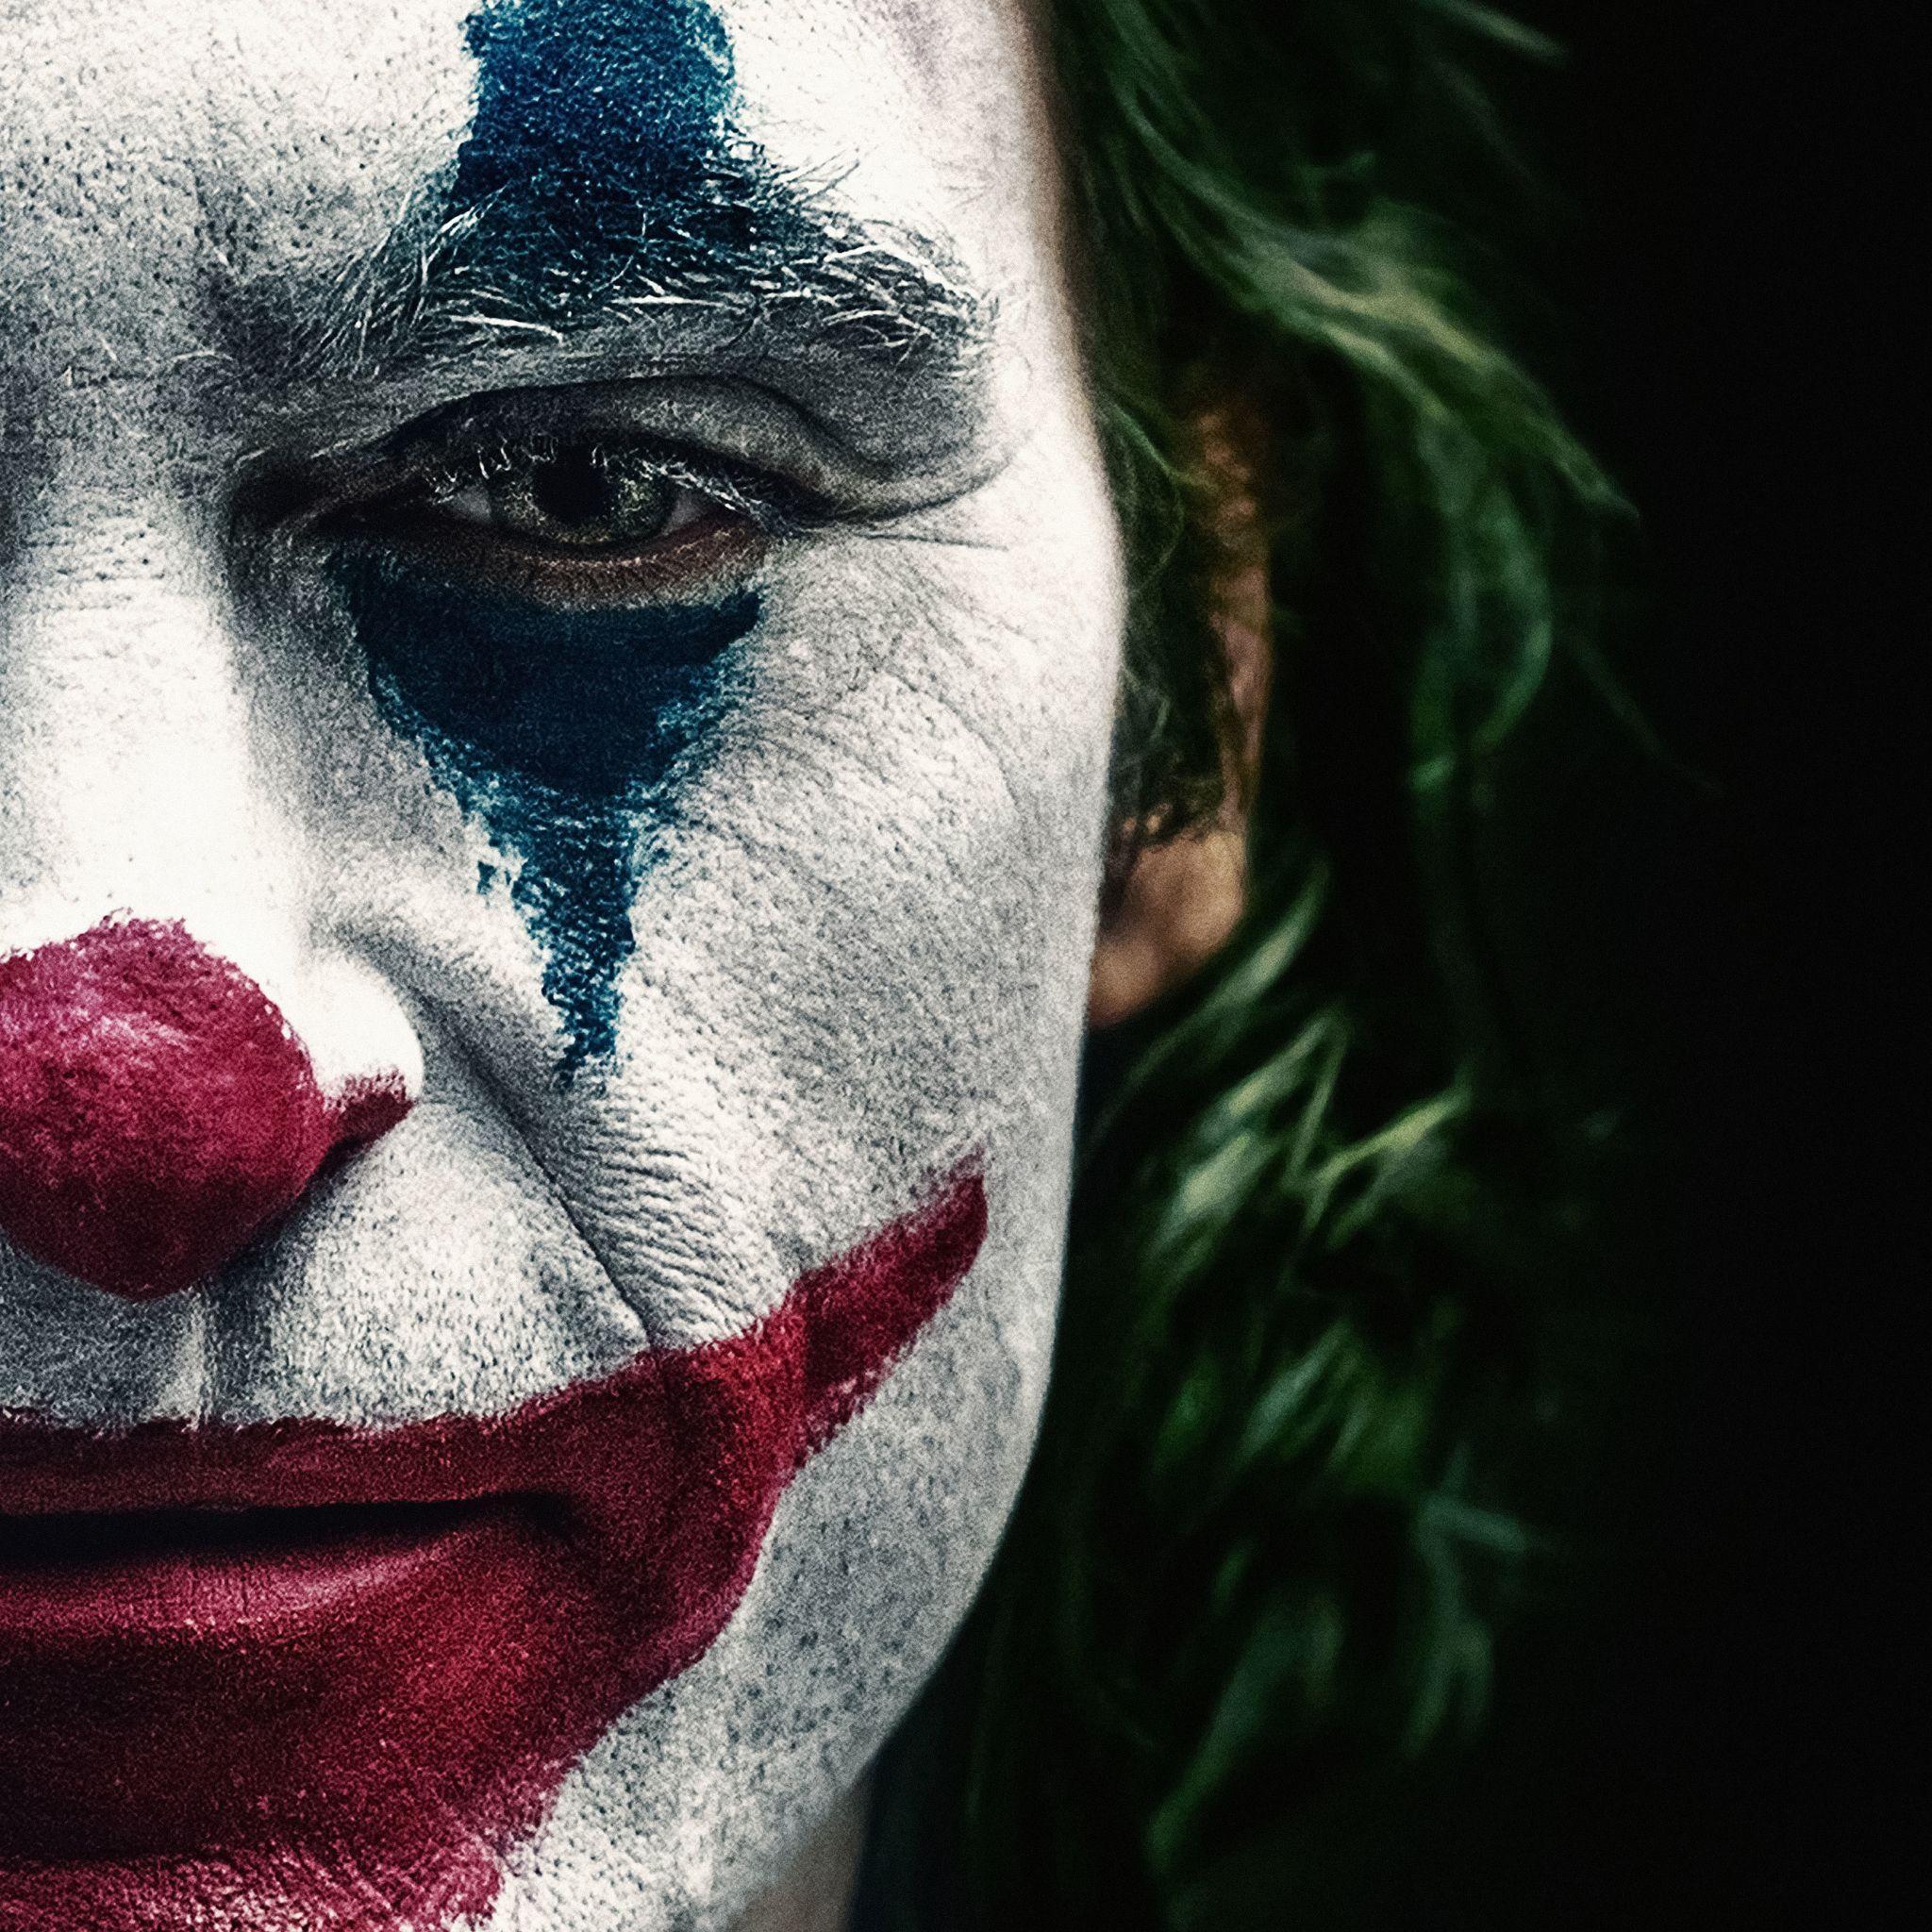 Joker Ipad Wallpapers Top Free Joker Ipad Backgrounds Wallpaperaccess